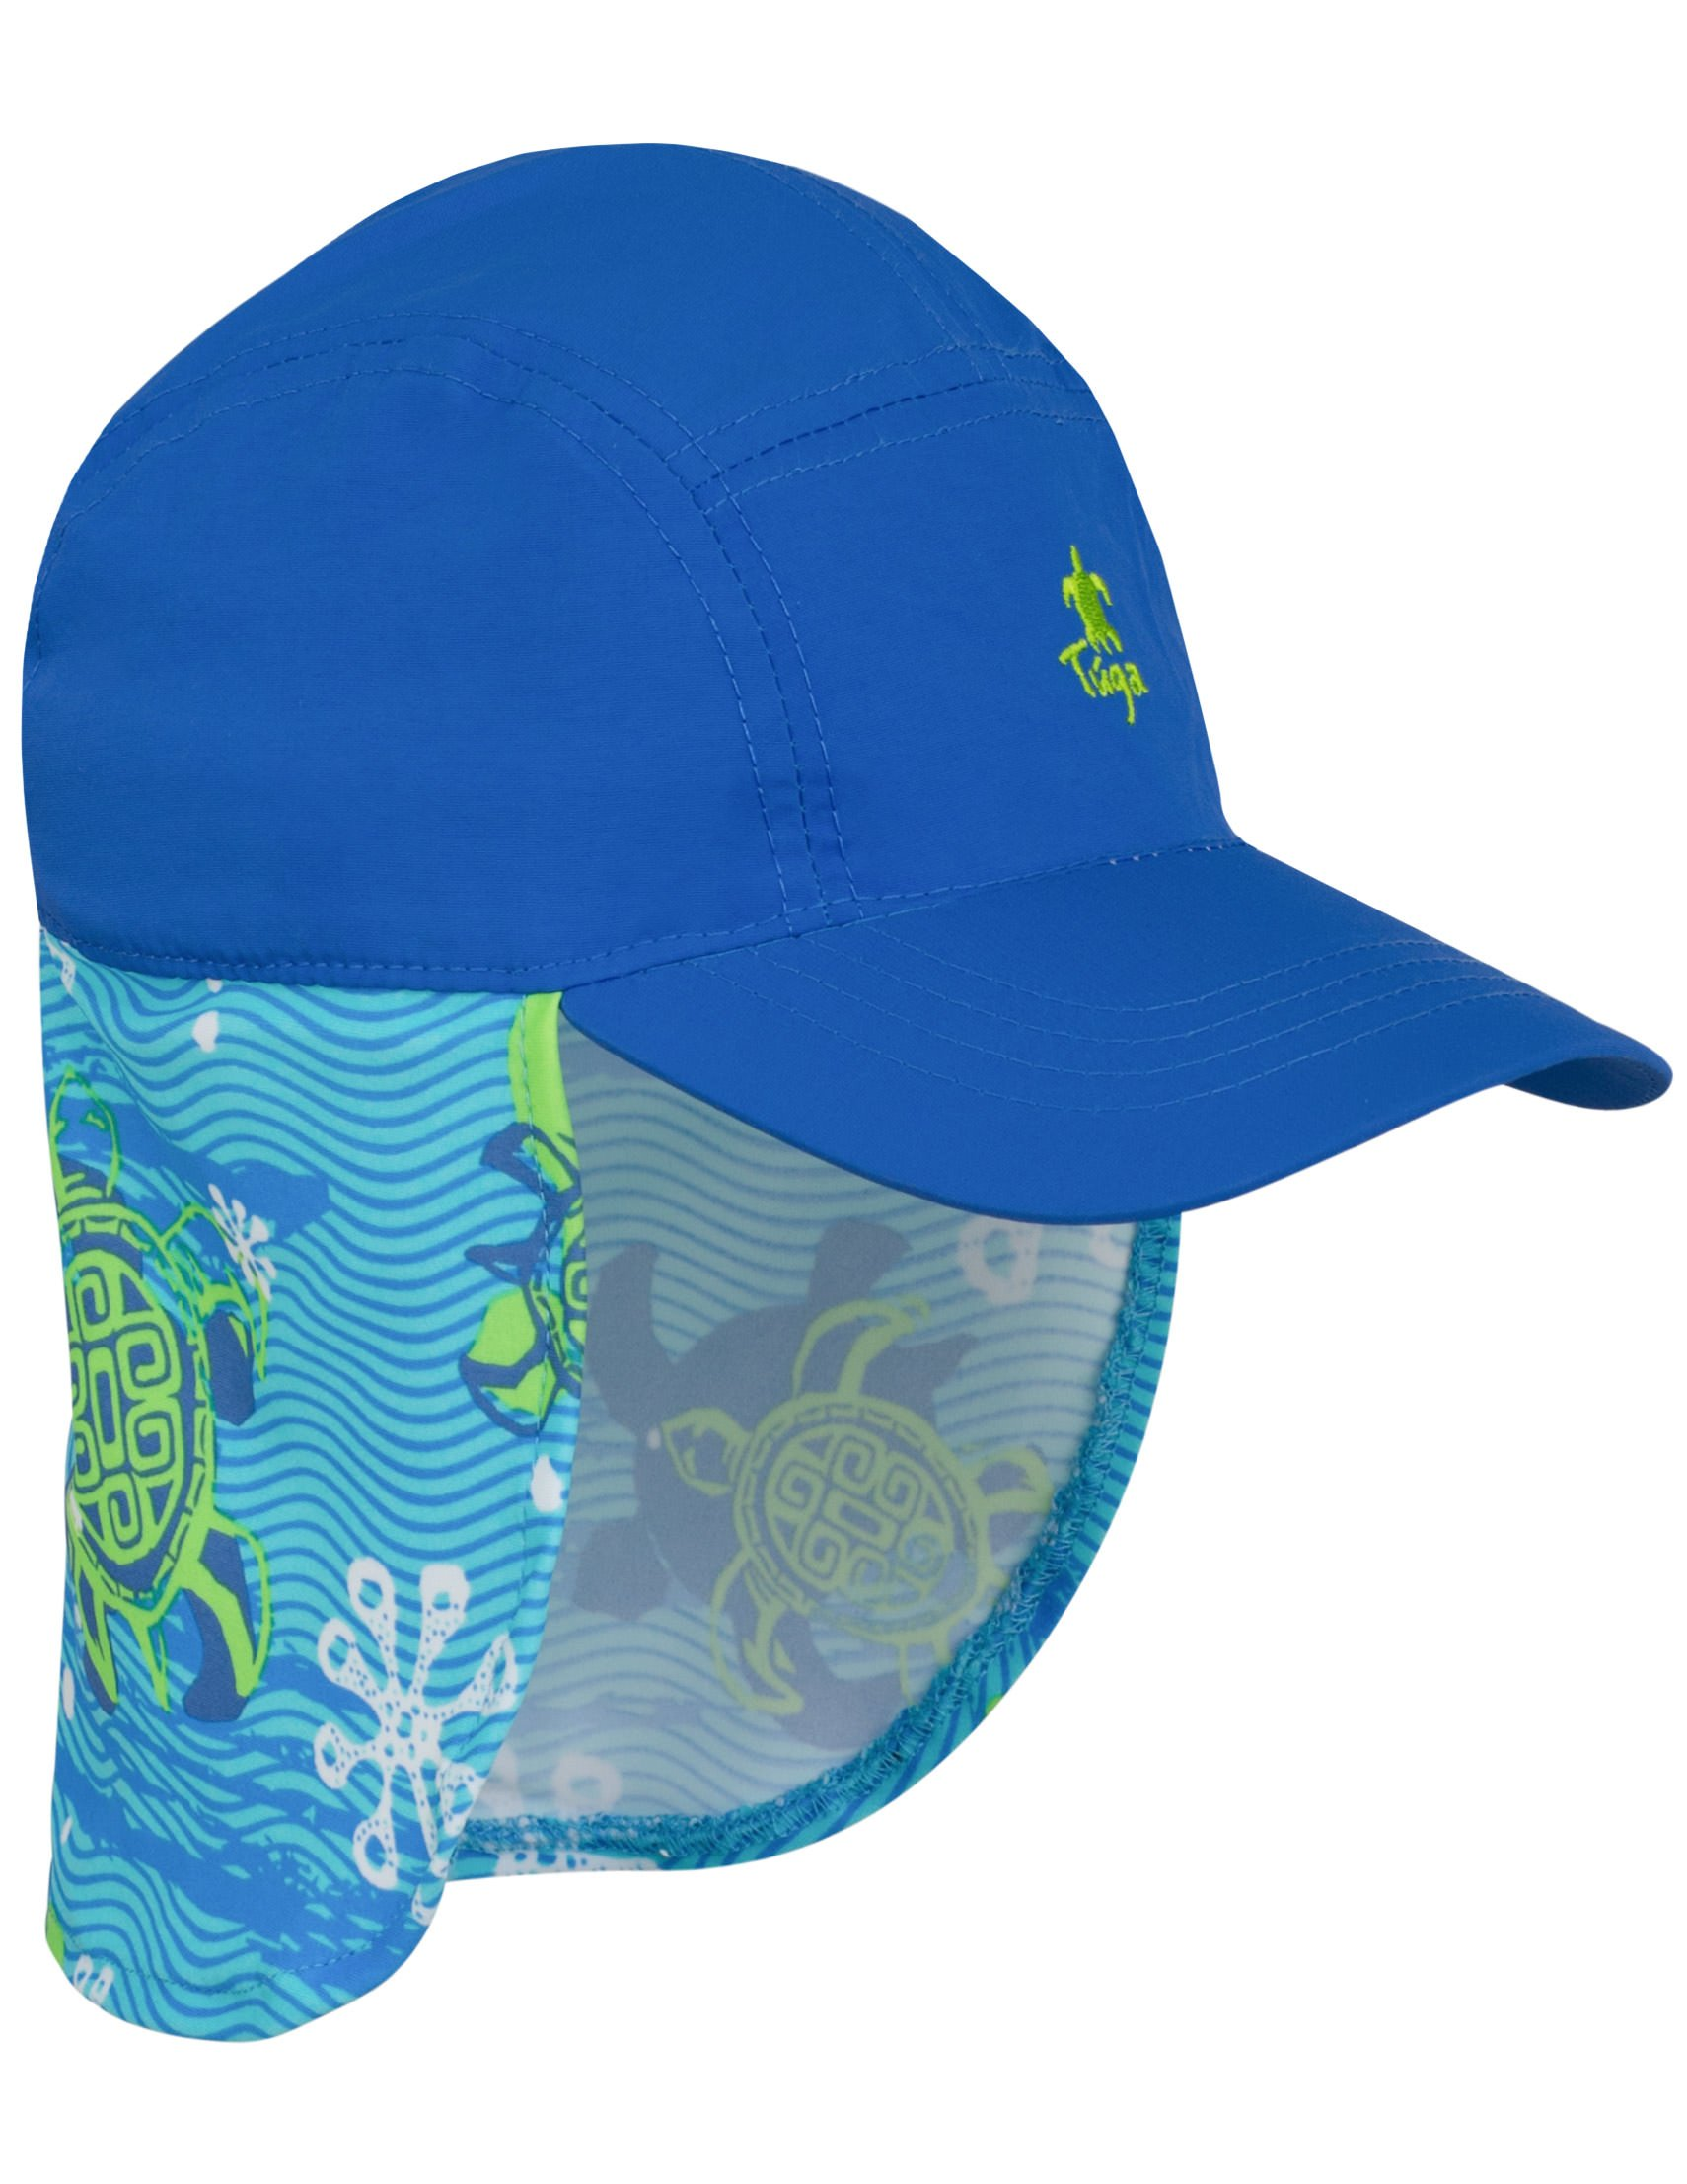 9c8e27db5f0 Tuga Boys Flap Hats - UPF 50+ Sun Protection Sun Hats product image